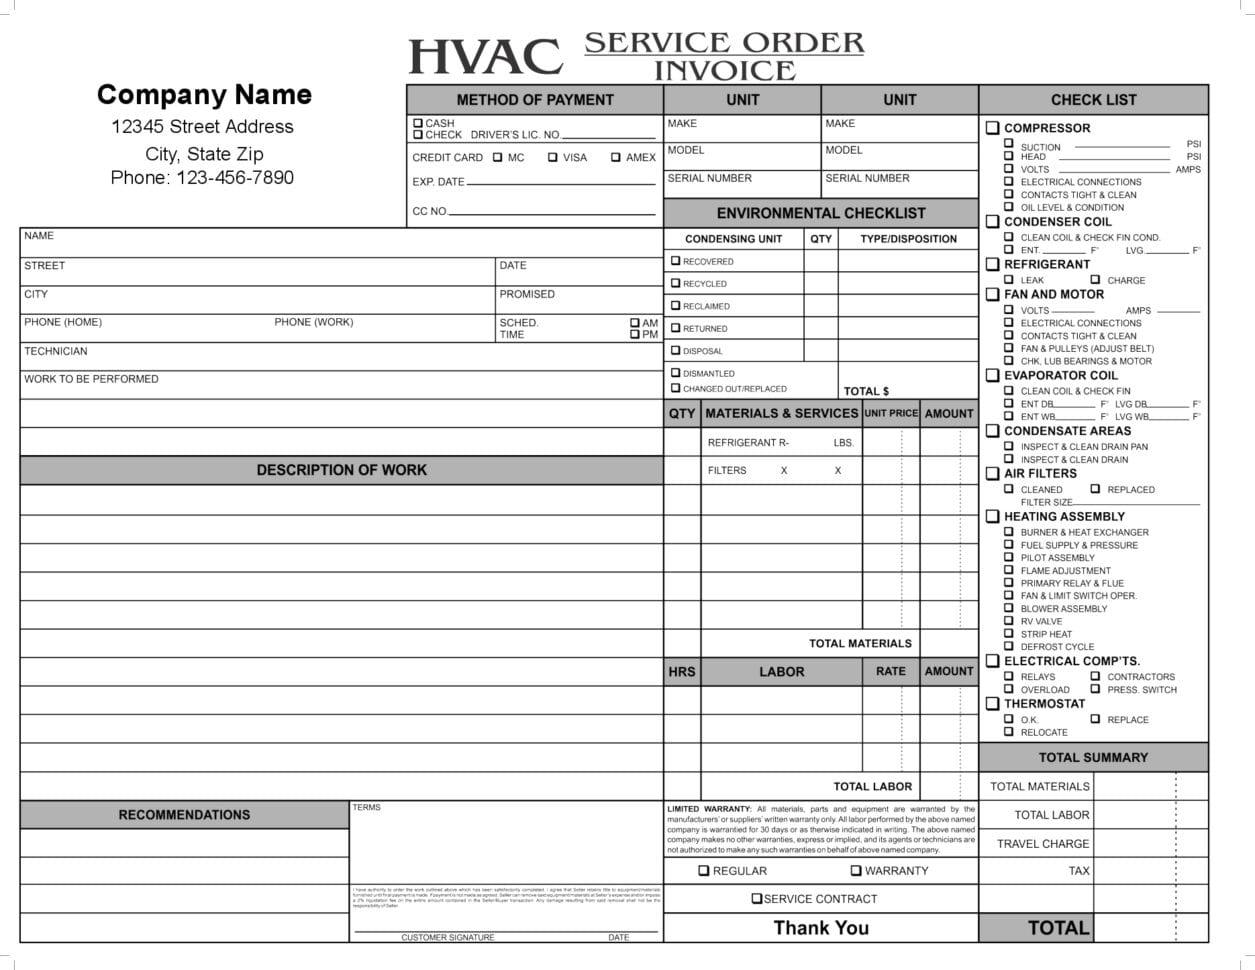 HVAC Service Order Invoice Templat